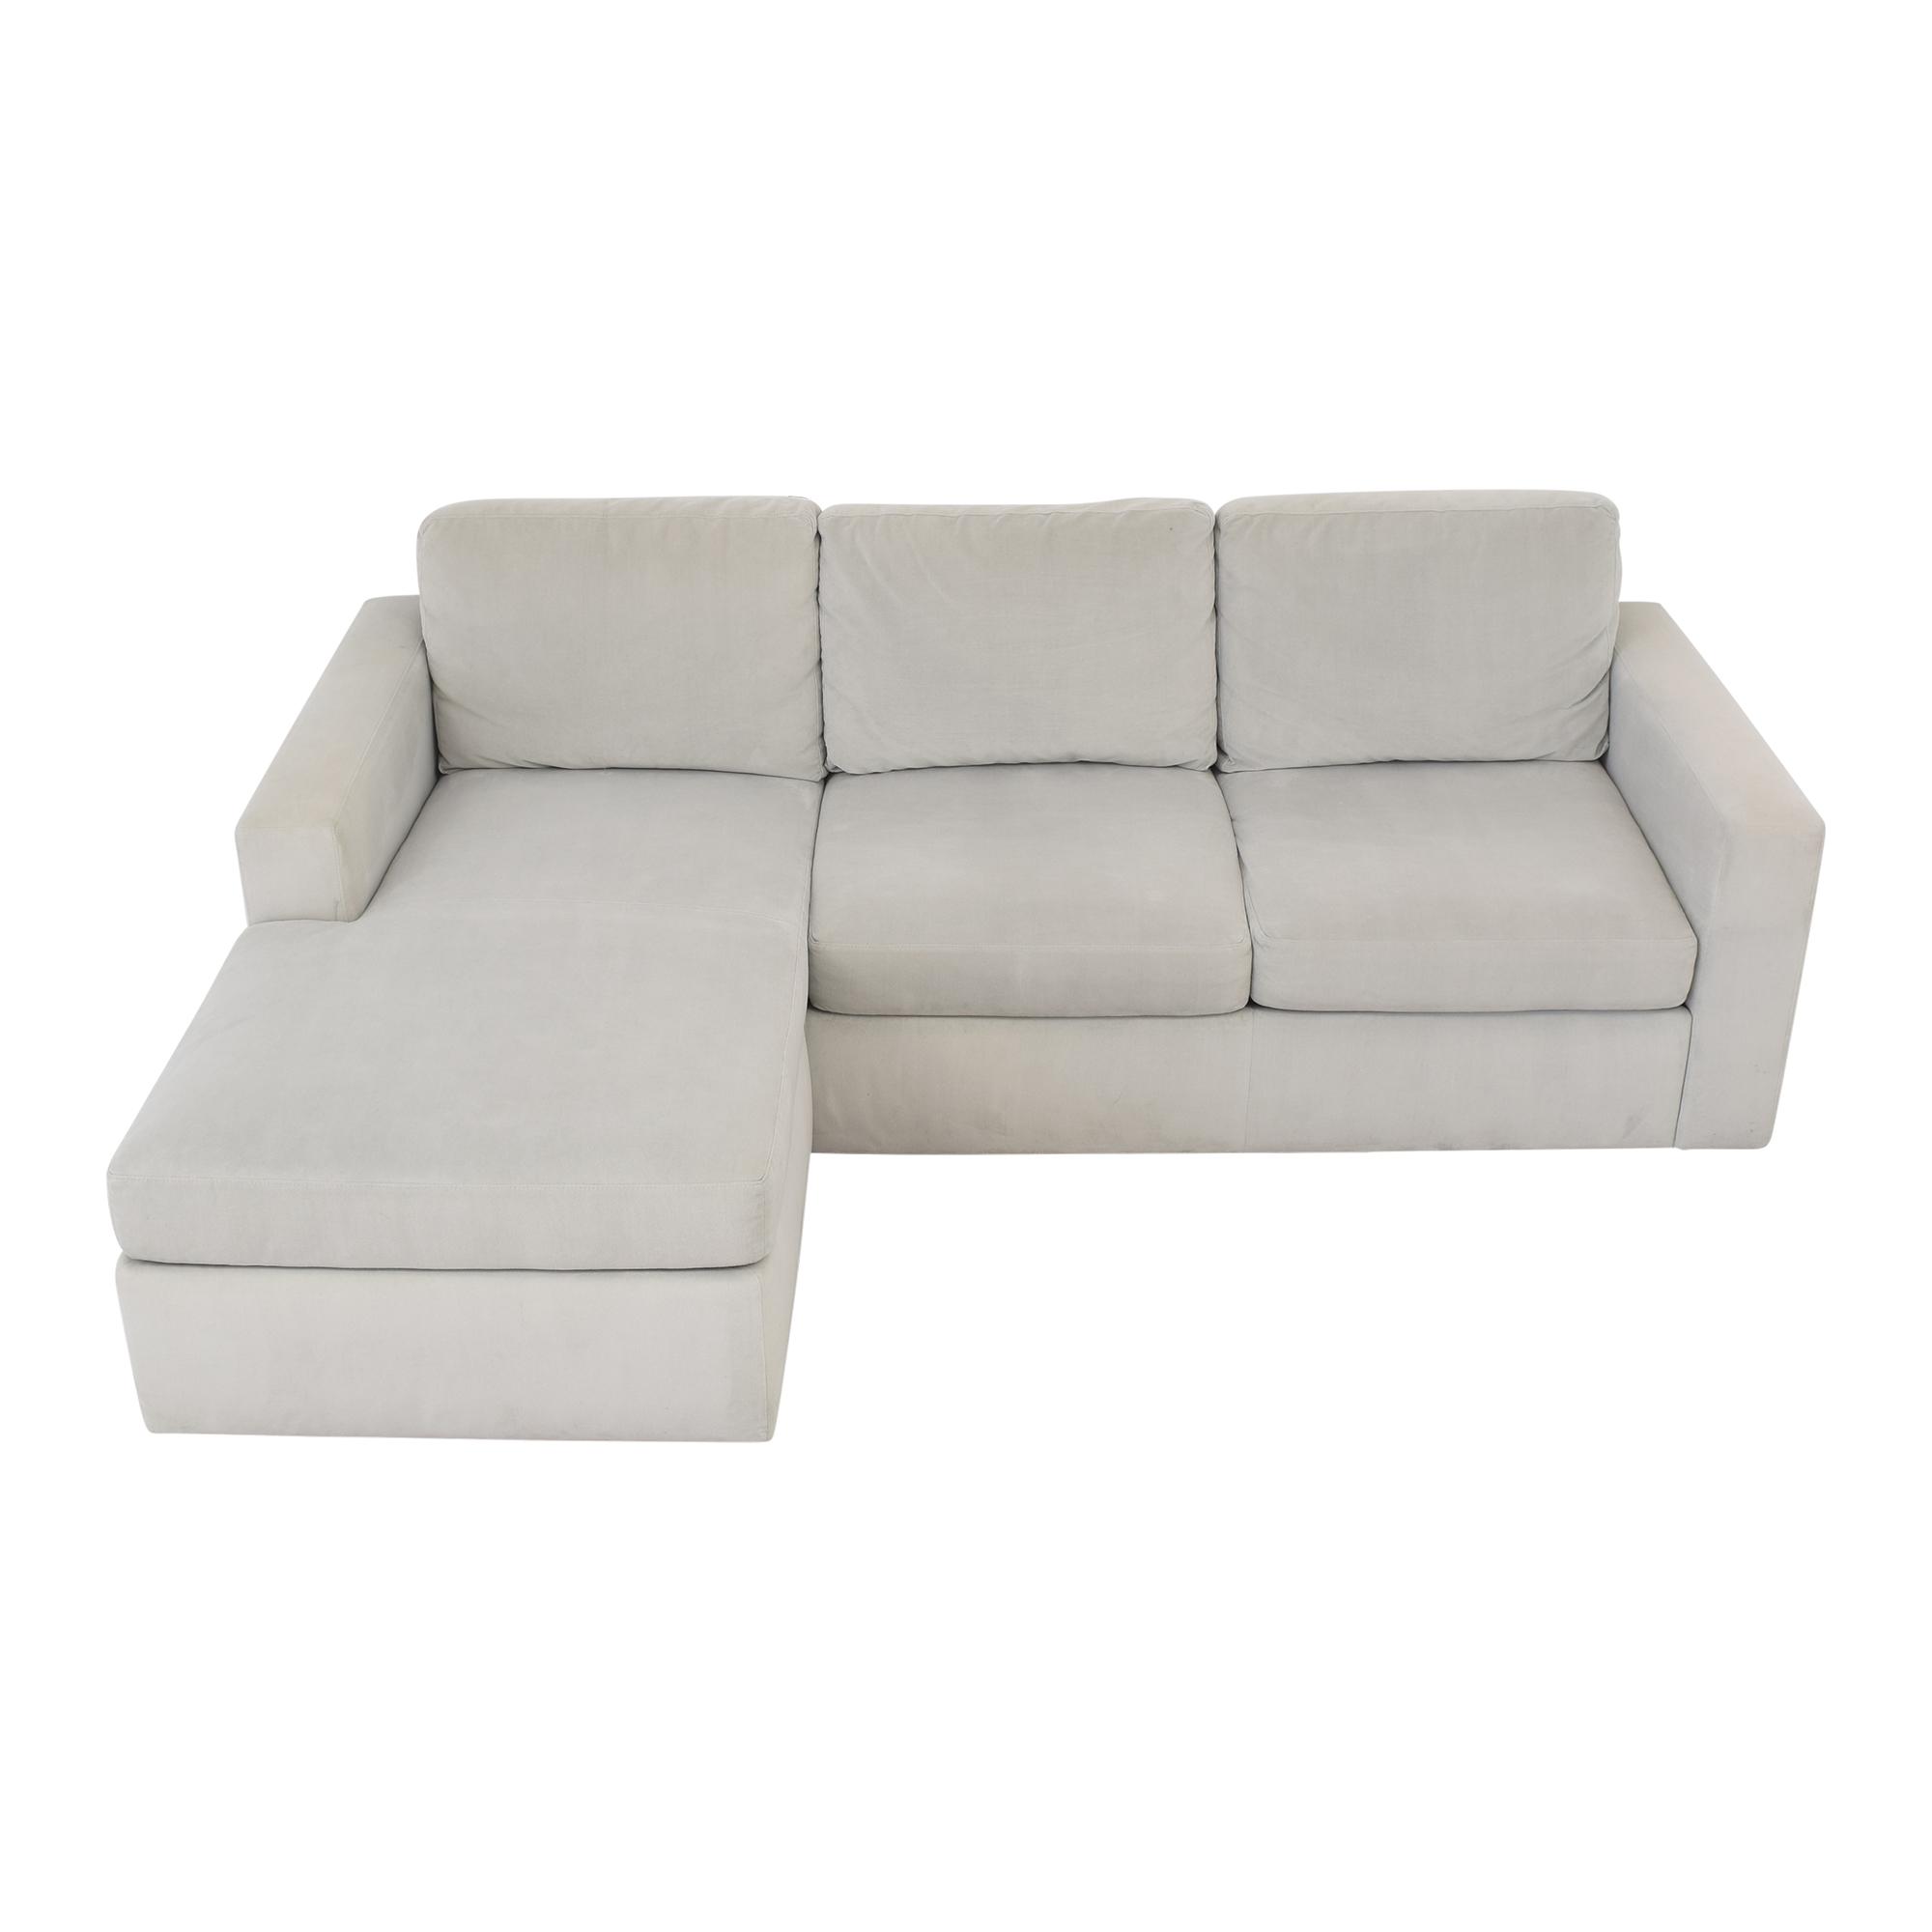 buy Room & Board Taft Sofa with Chaise Room & Board